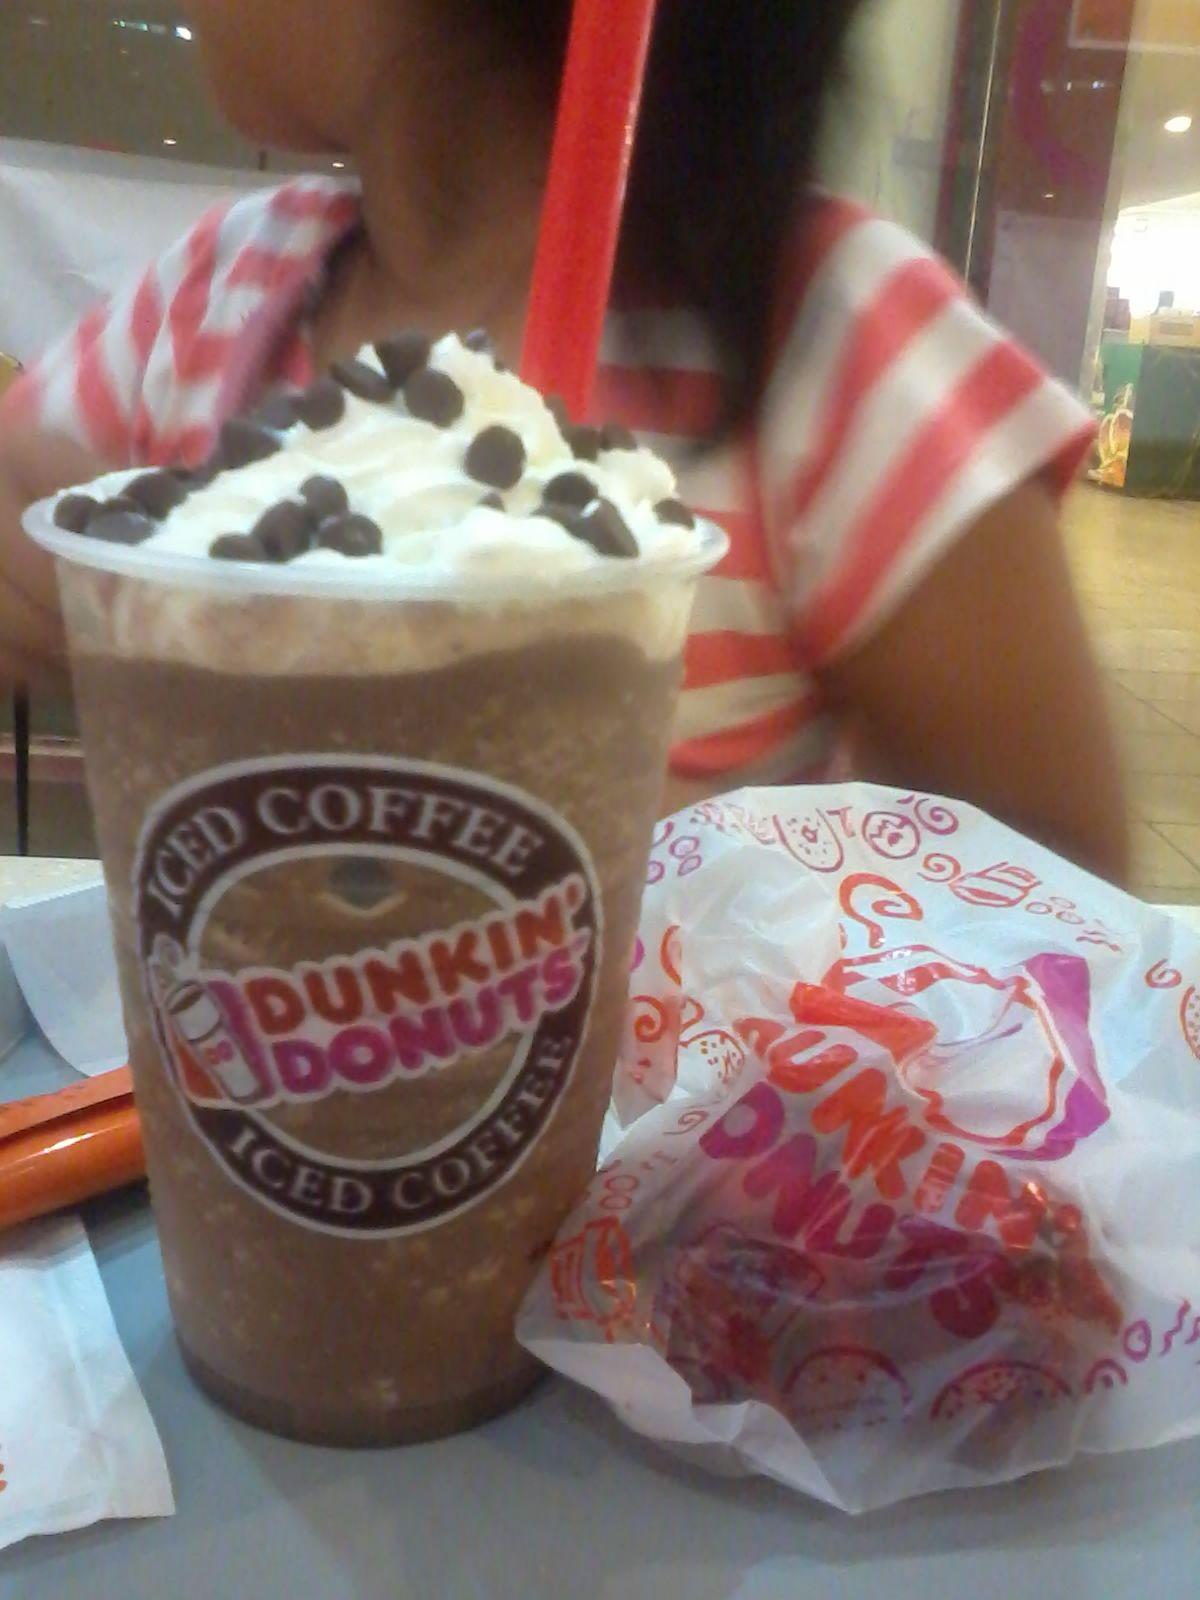 Mocha choco iced drink dunkin donuts Iced drinks